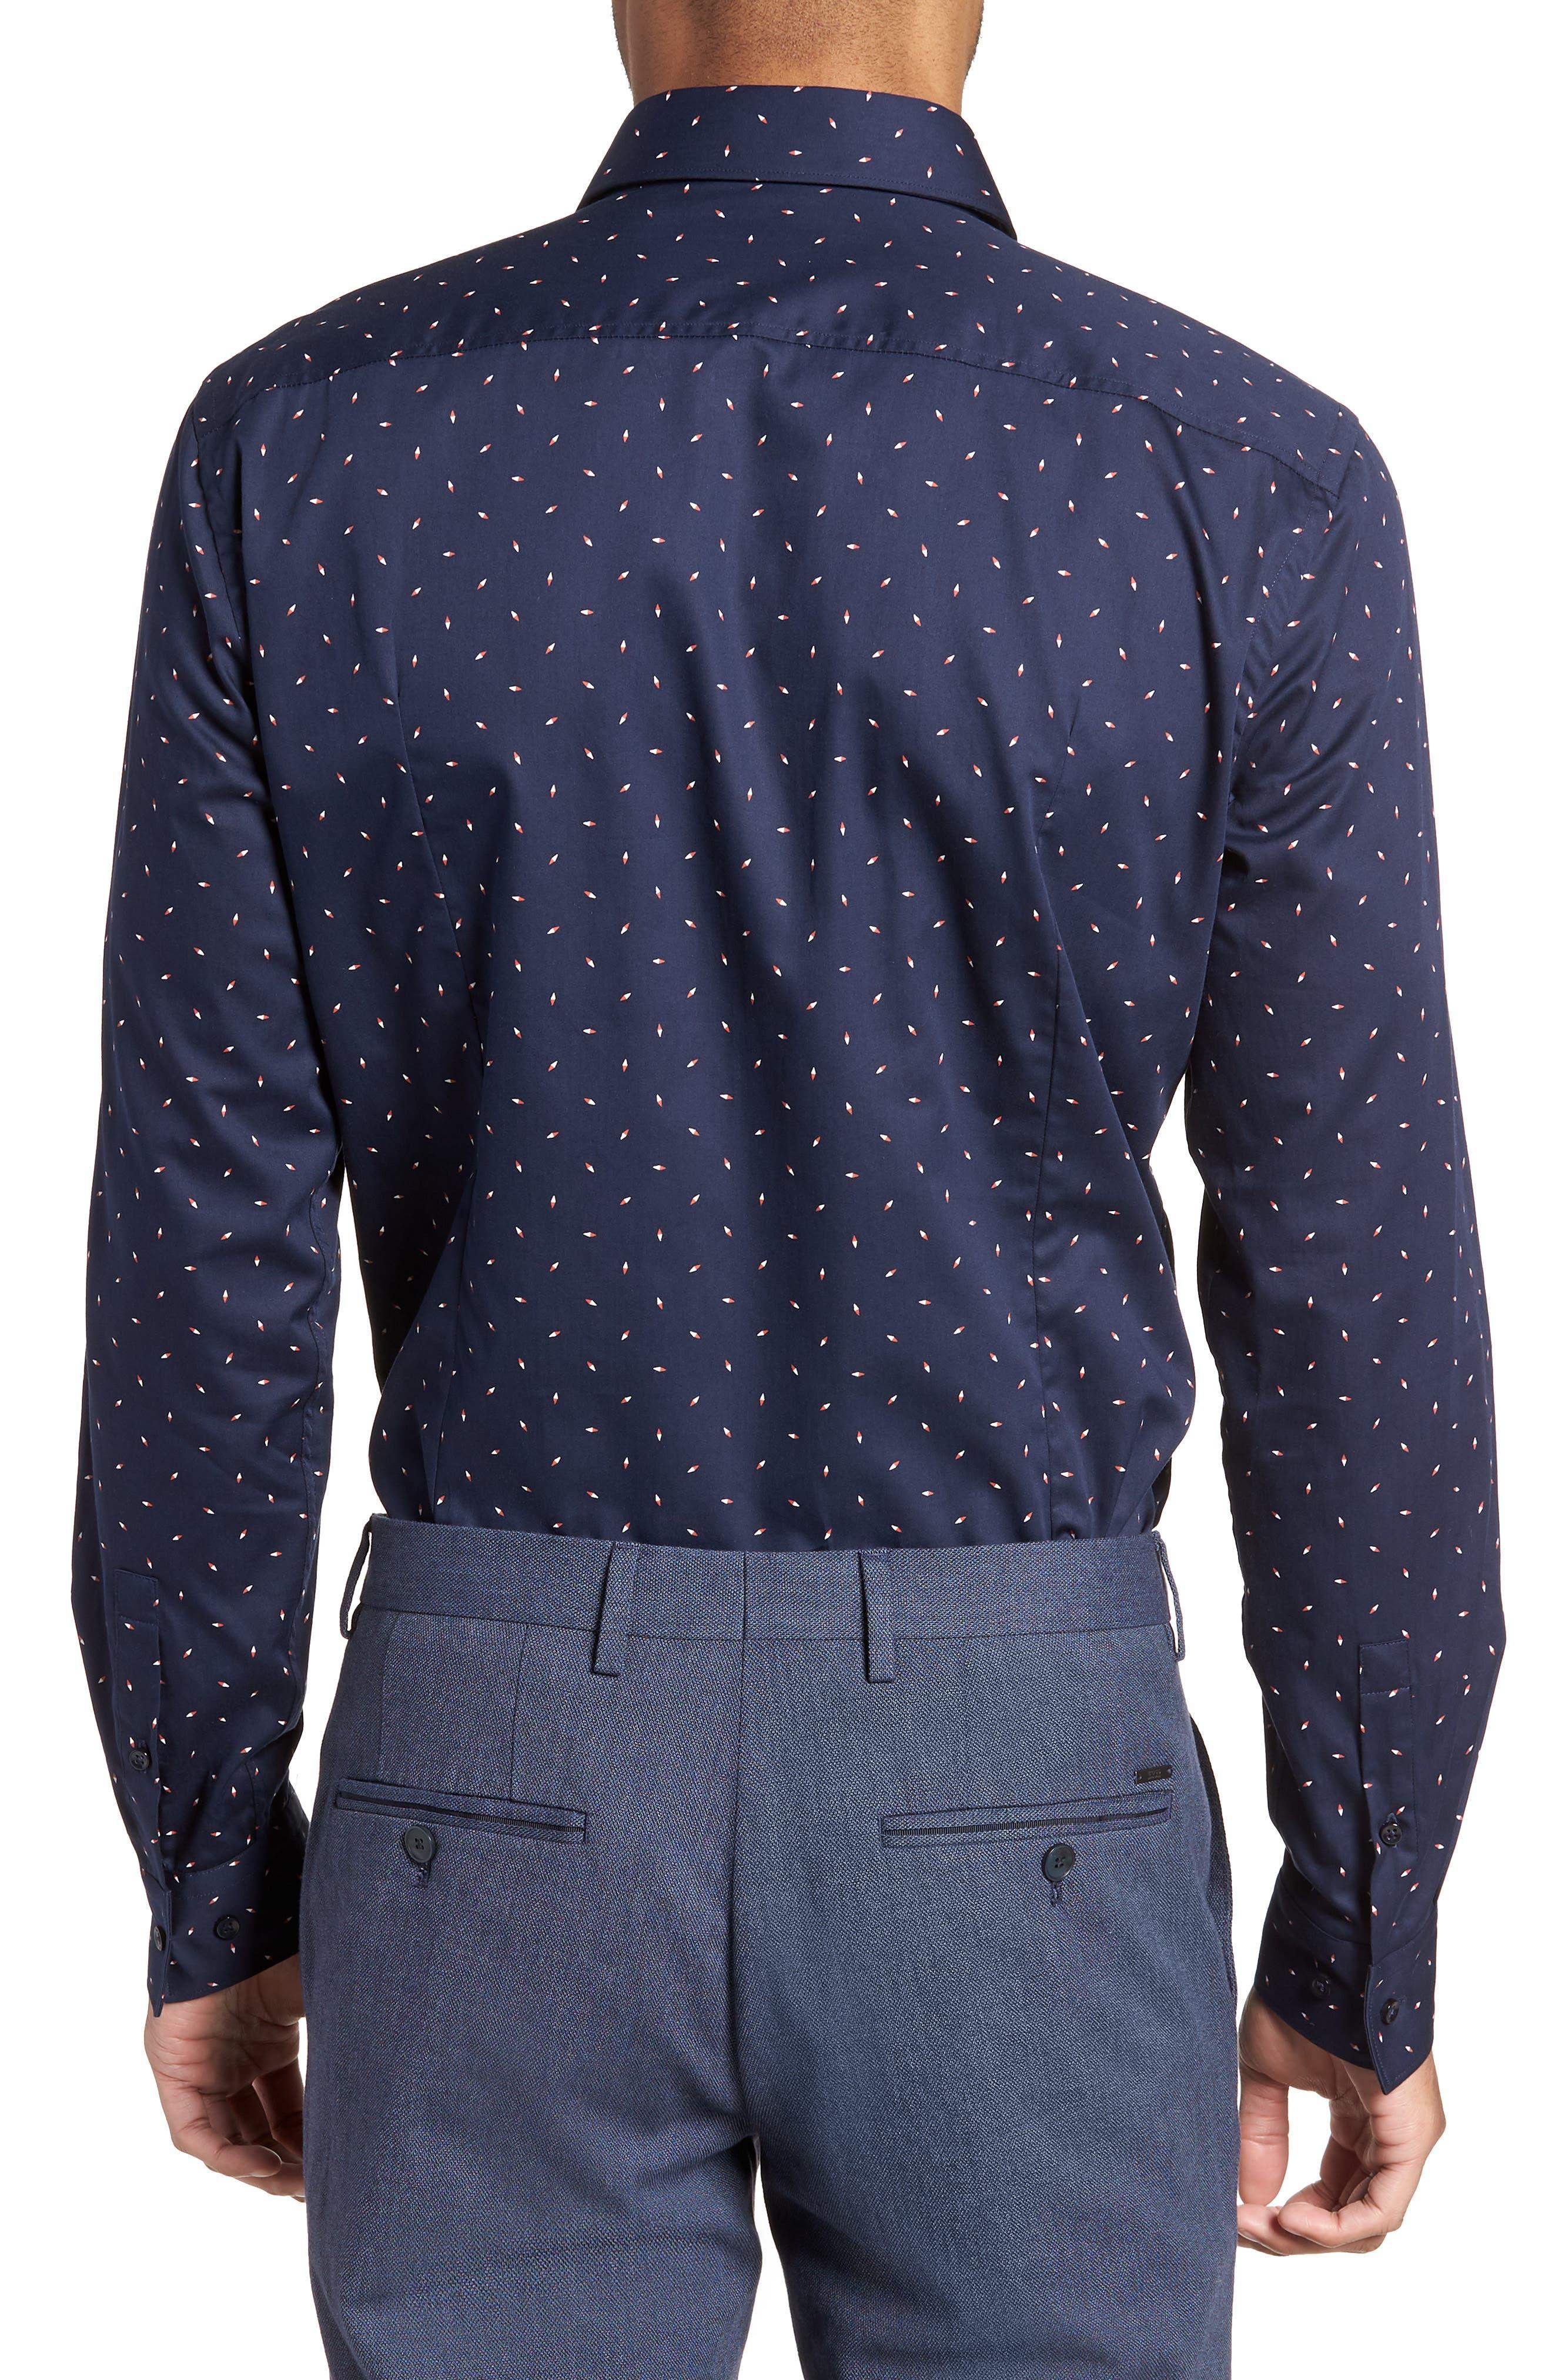 Ismo Slim Fit Print Dress Shirt,                             Alternate thumbnail 3, color,                             Navy